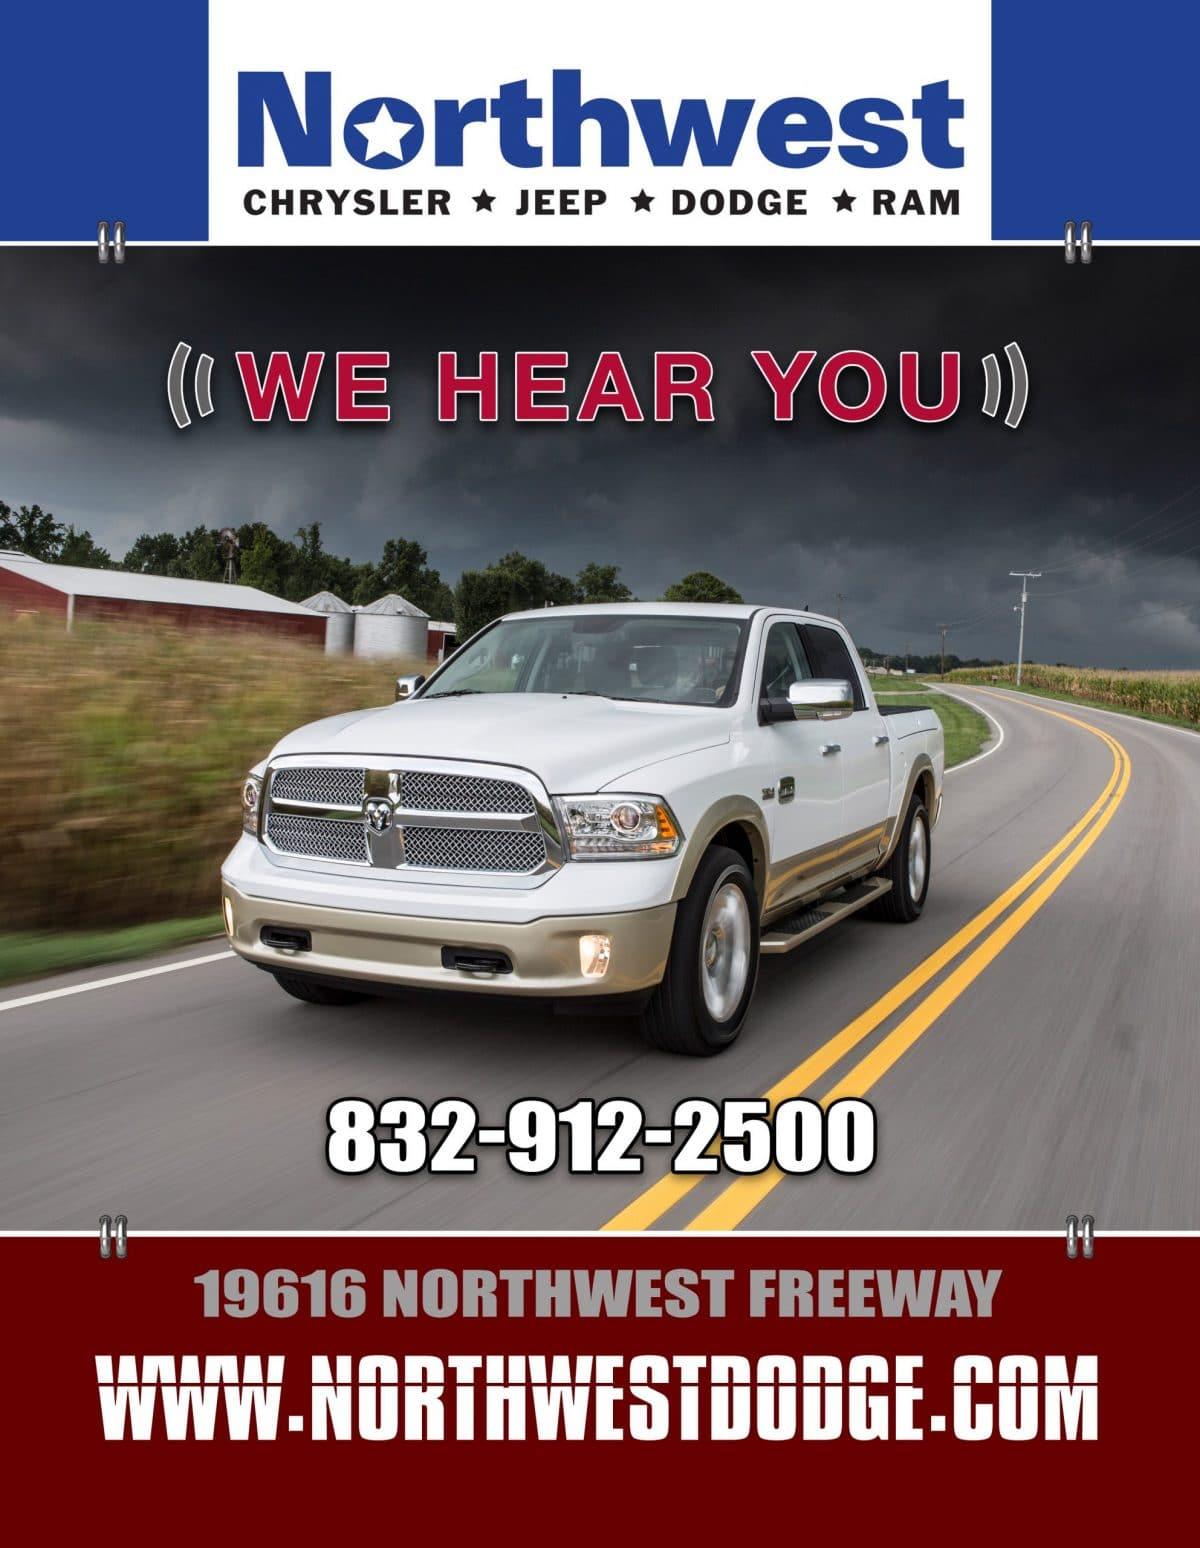 Northwest Dodge